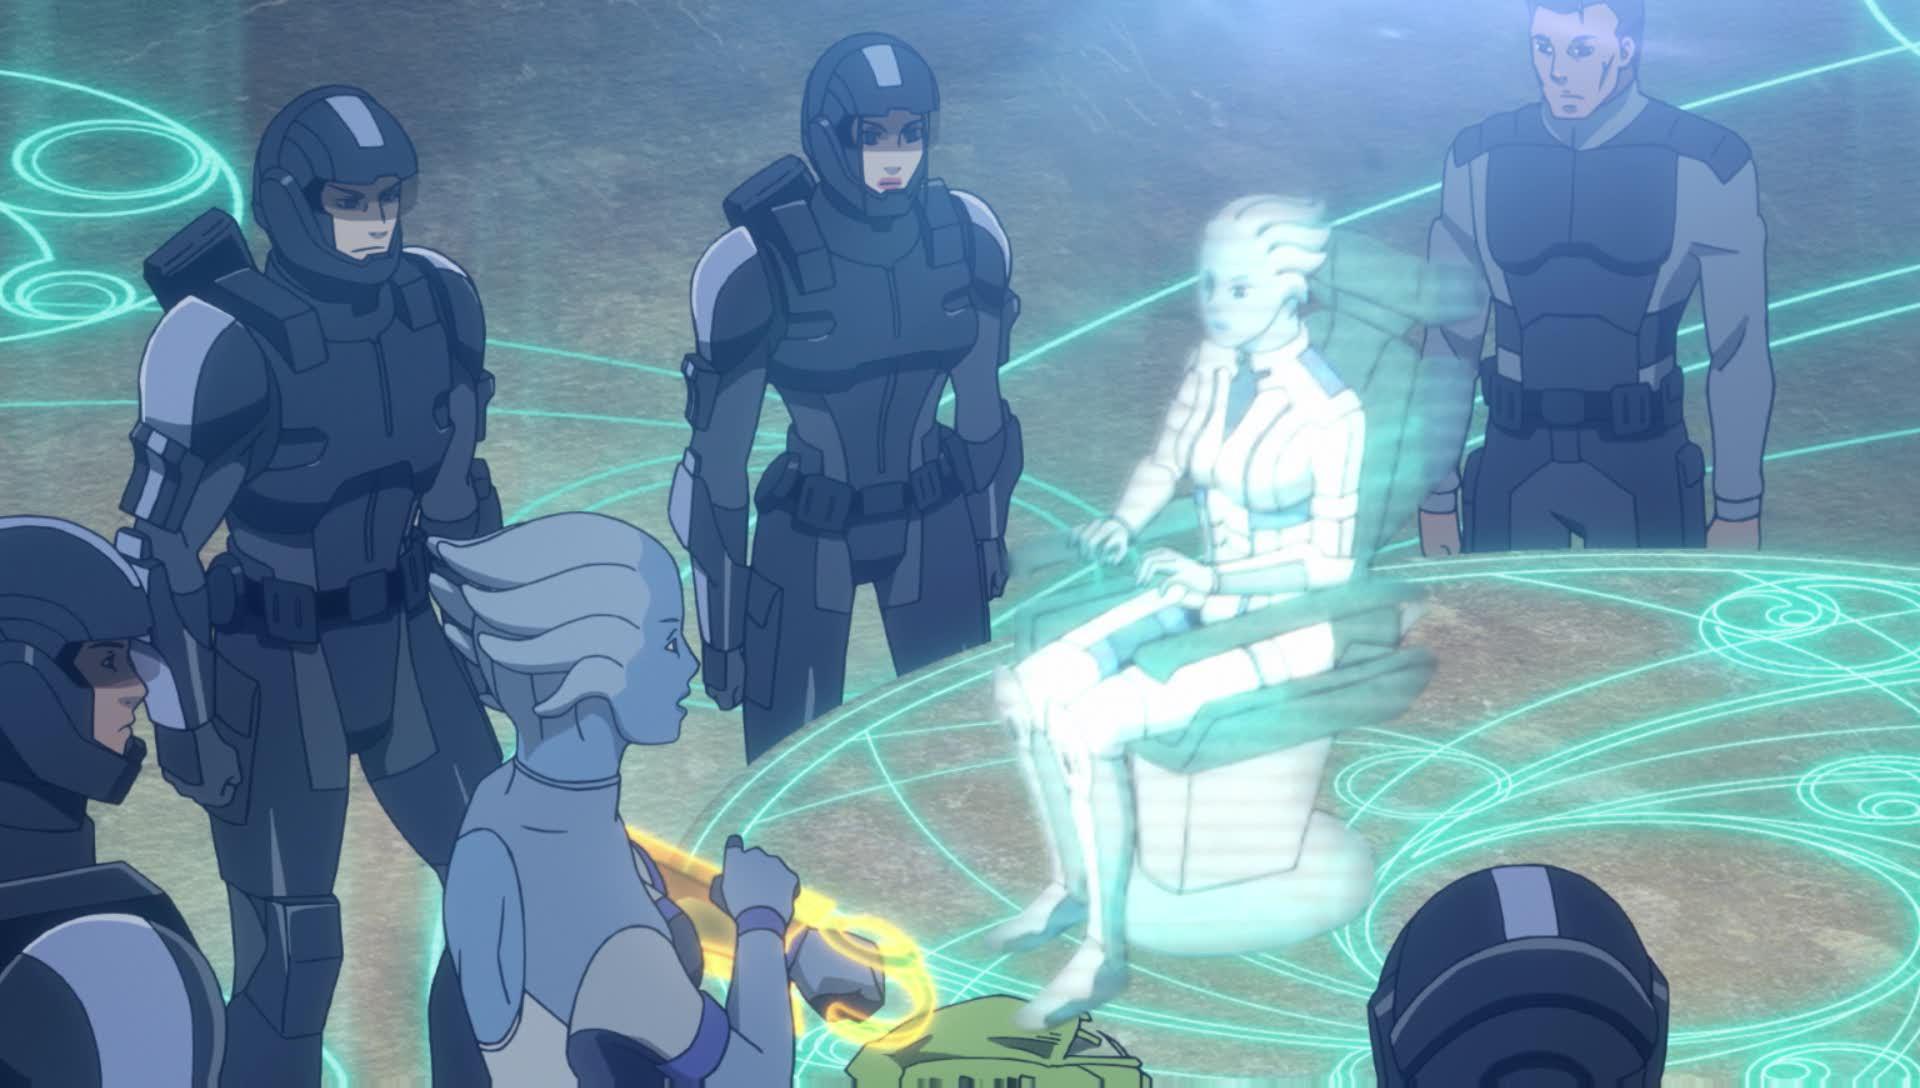 Watch Mass Effect Season 1 Movie 1 Dub Anime Uncut Funimation